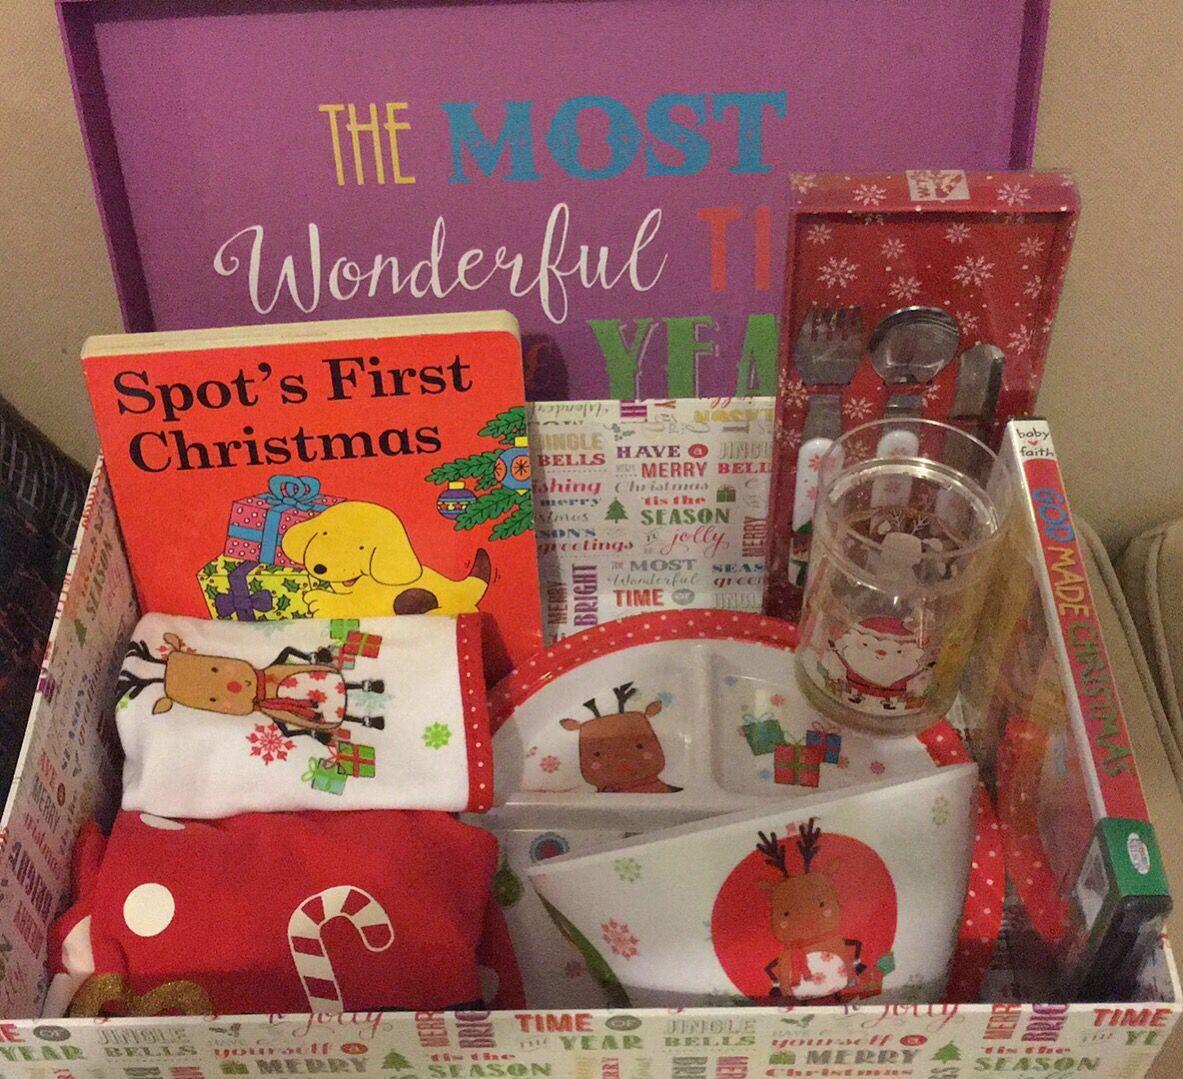 Xmas Eve Box Ideas #xmaseveboxideas | Xmas eve boxes, Baby's first christmas gifts, Christmas ...